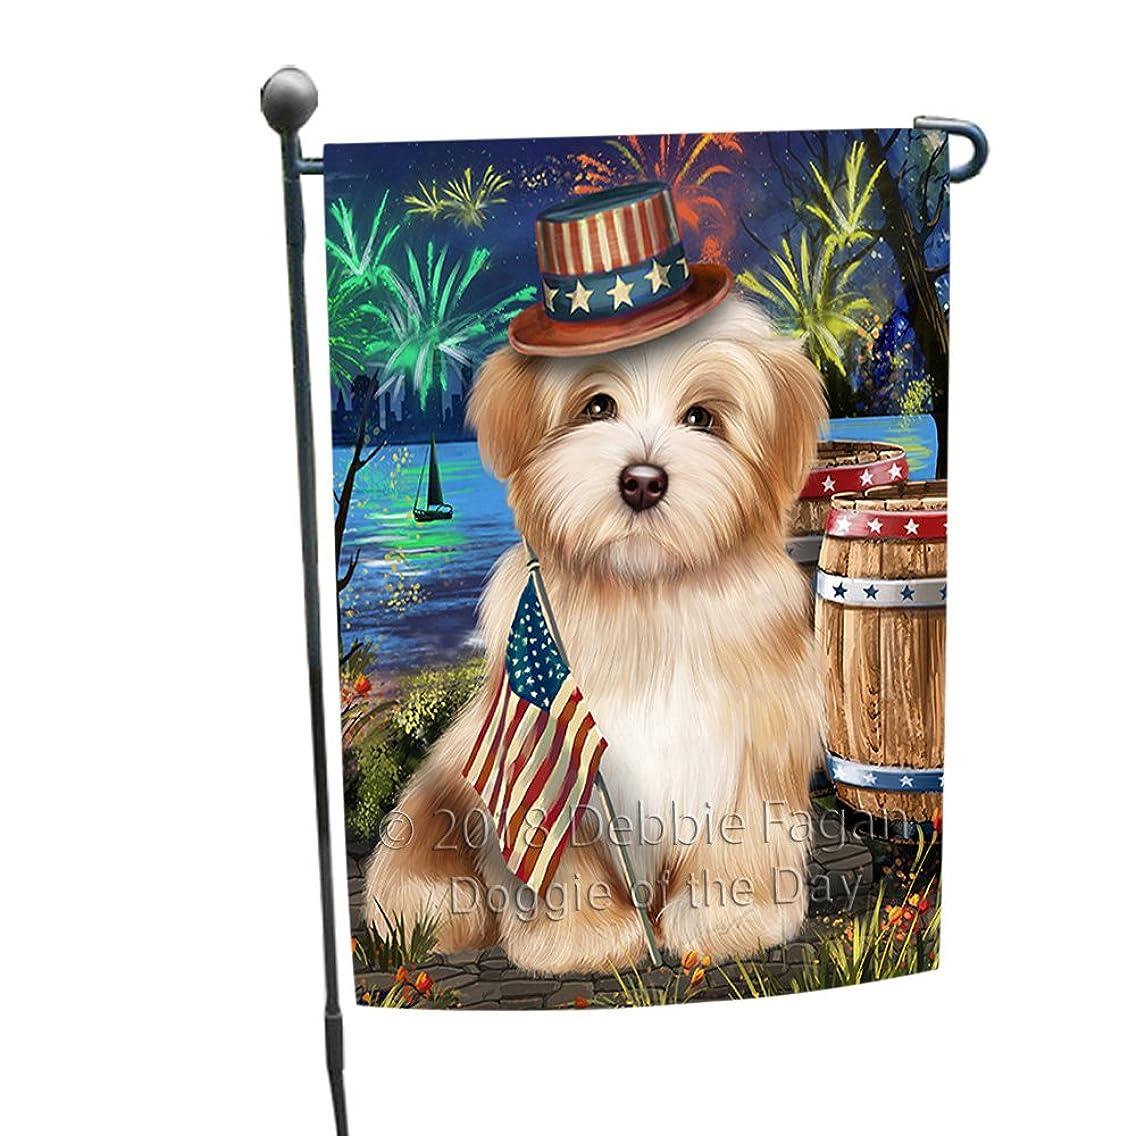 4th of July Independence Day Fireworks Havanese Dog at the Lake Garden Flag GFLG51091